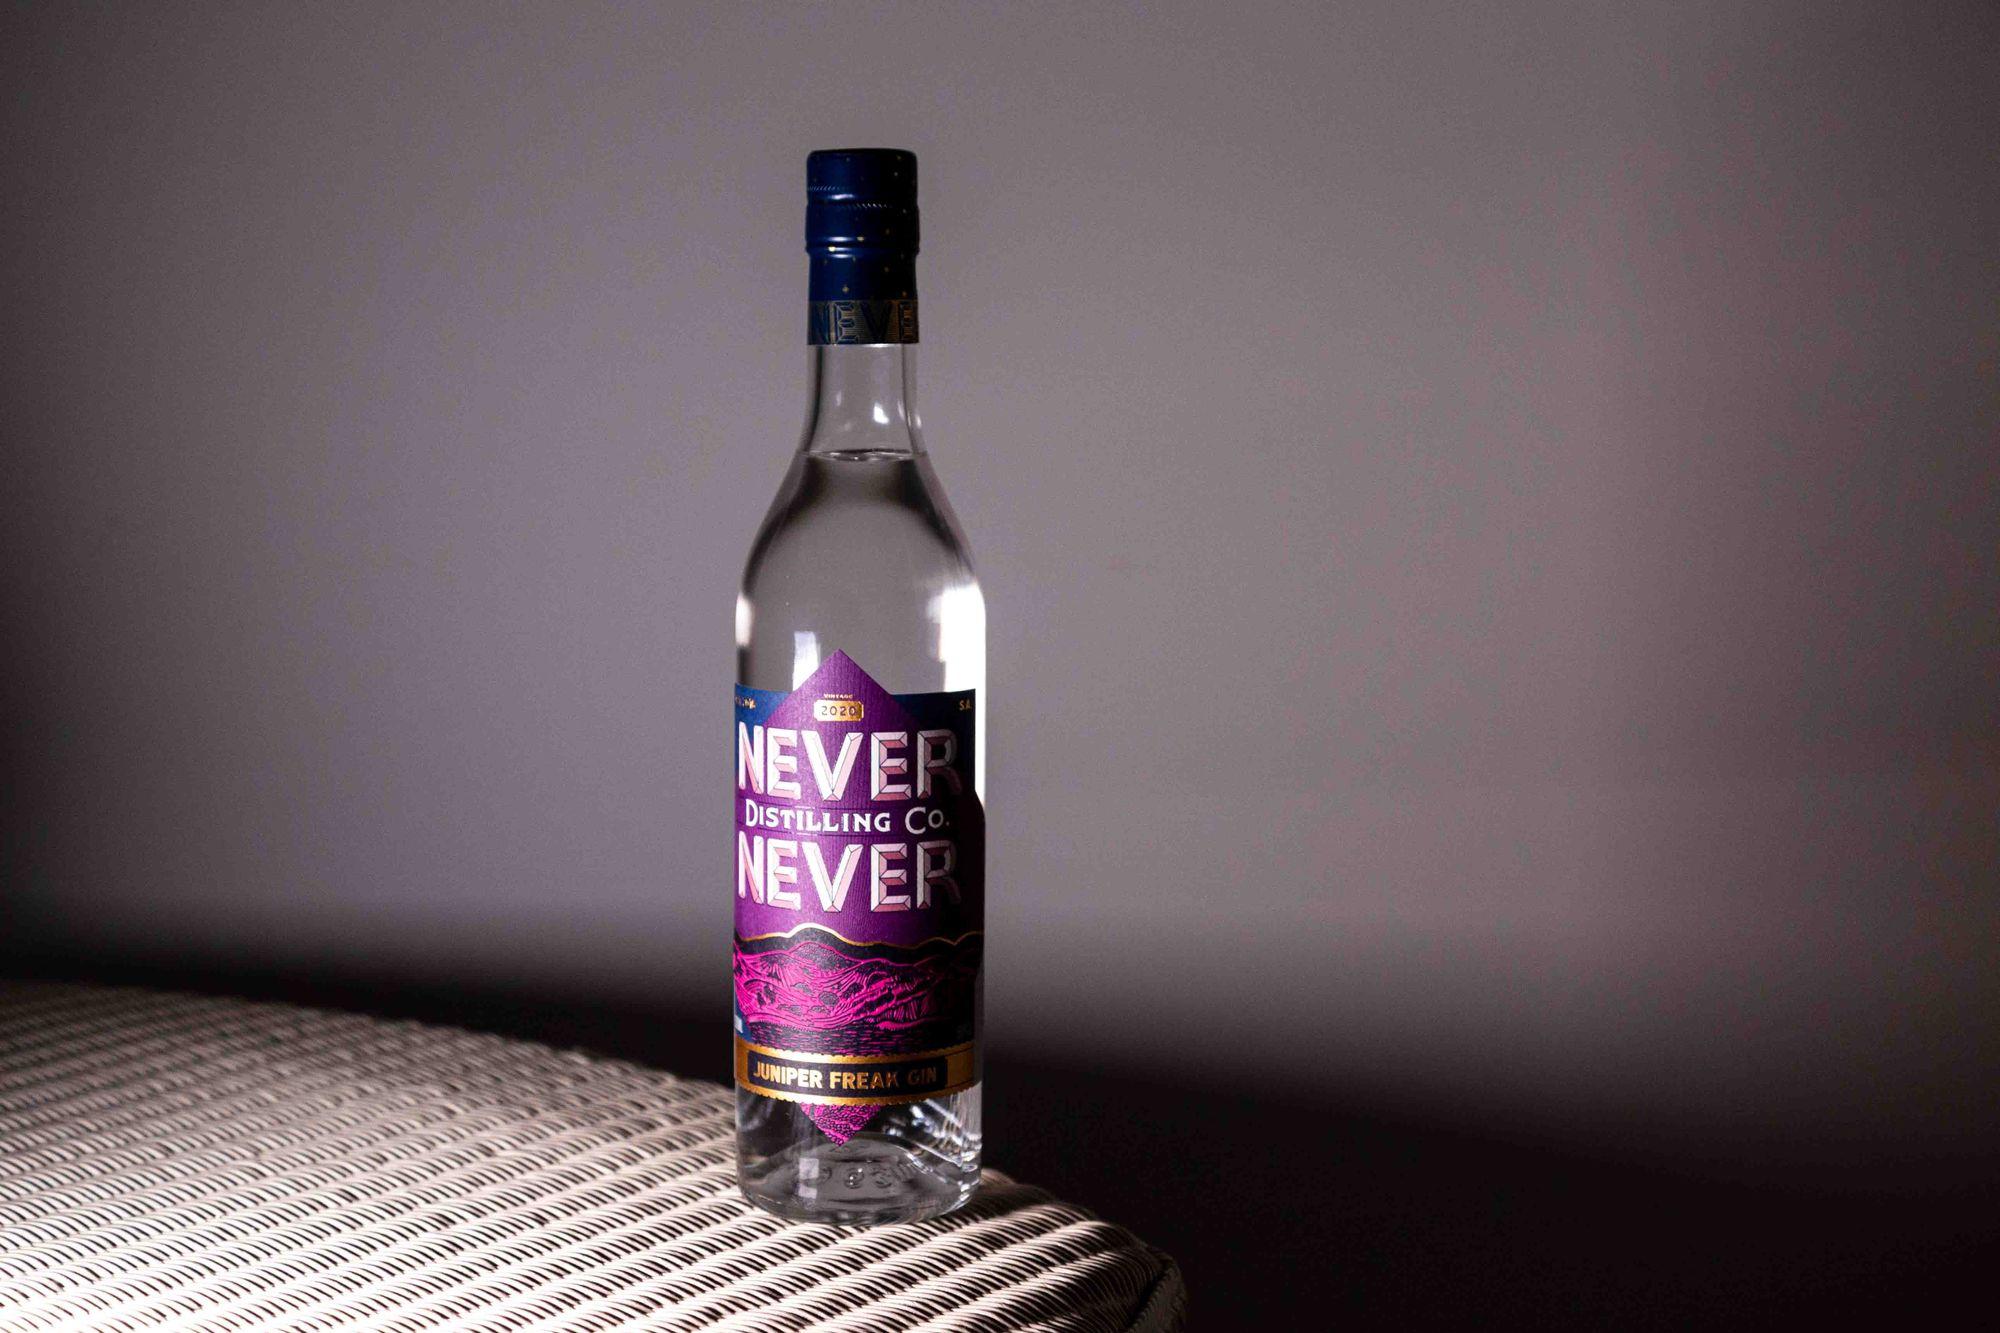 The Never Never Distilling Co. Juniper Freak Gin 2020. Photo: Boothby